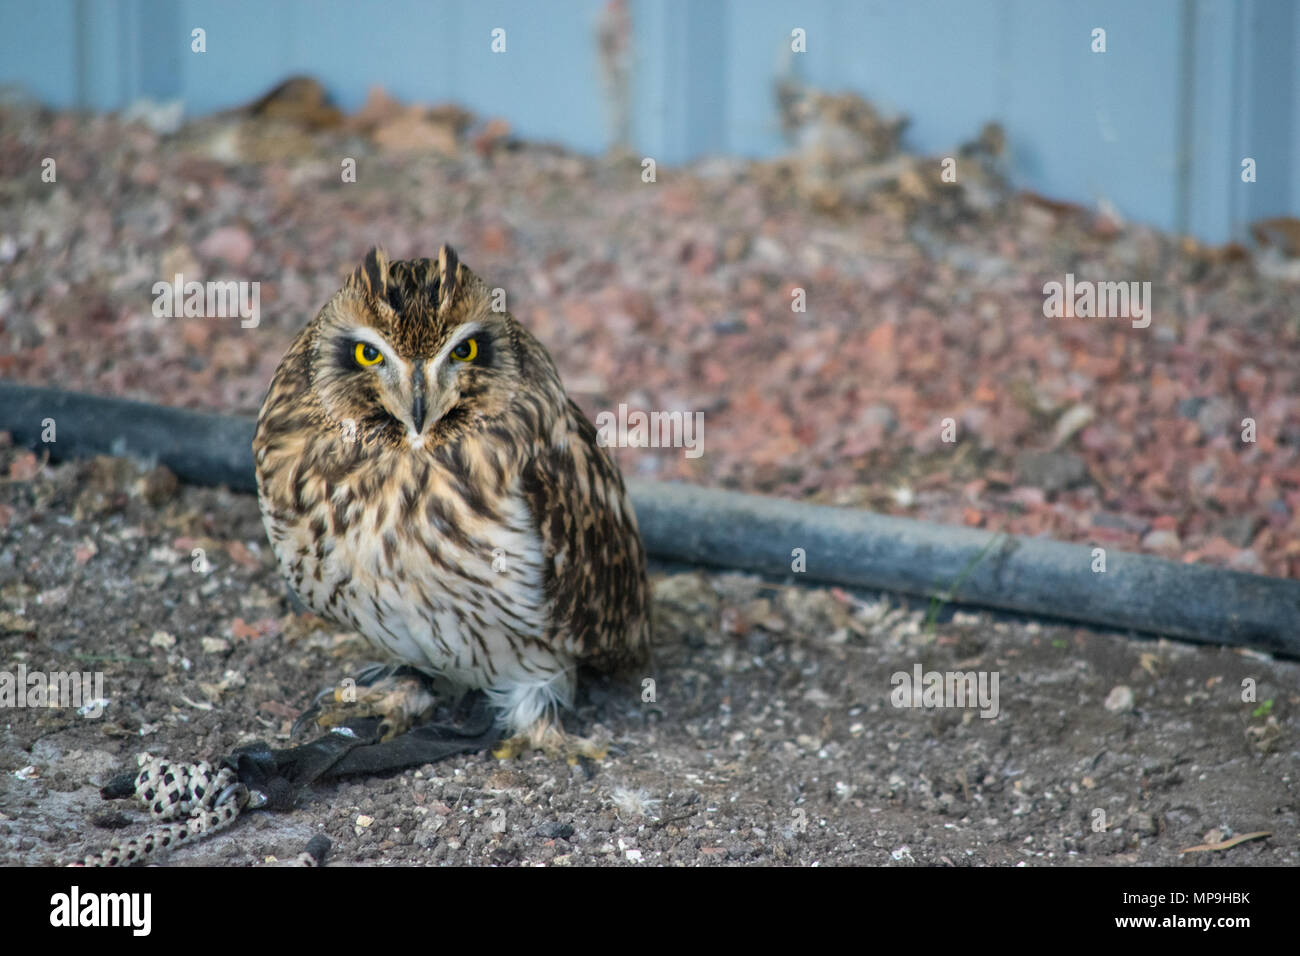 Short-eared owl (asio flammeus) is a species of typical owl (family Strigidae). Alberta Birds of Prey Foundation, Coaldale, Alberta. - Stock Image